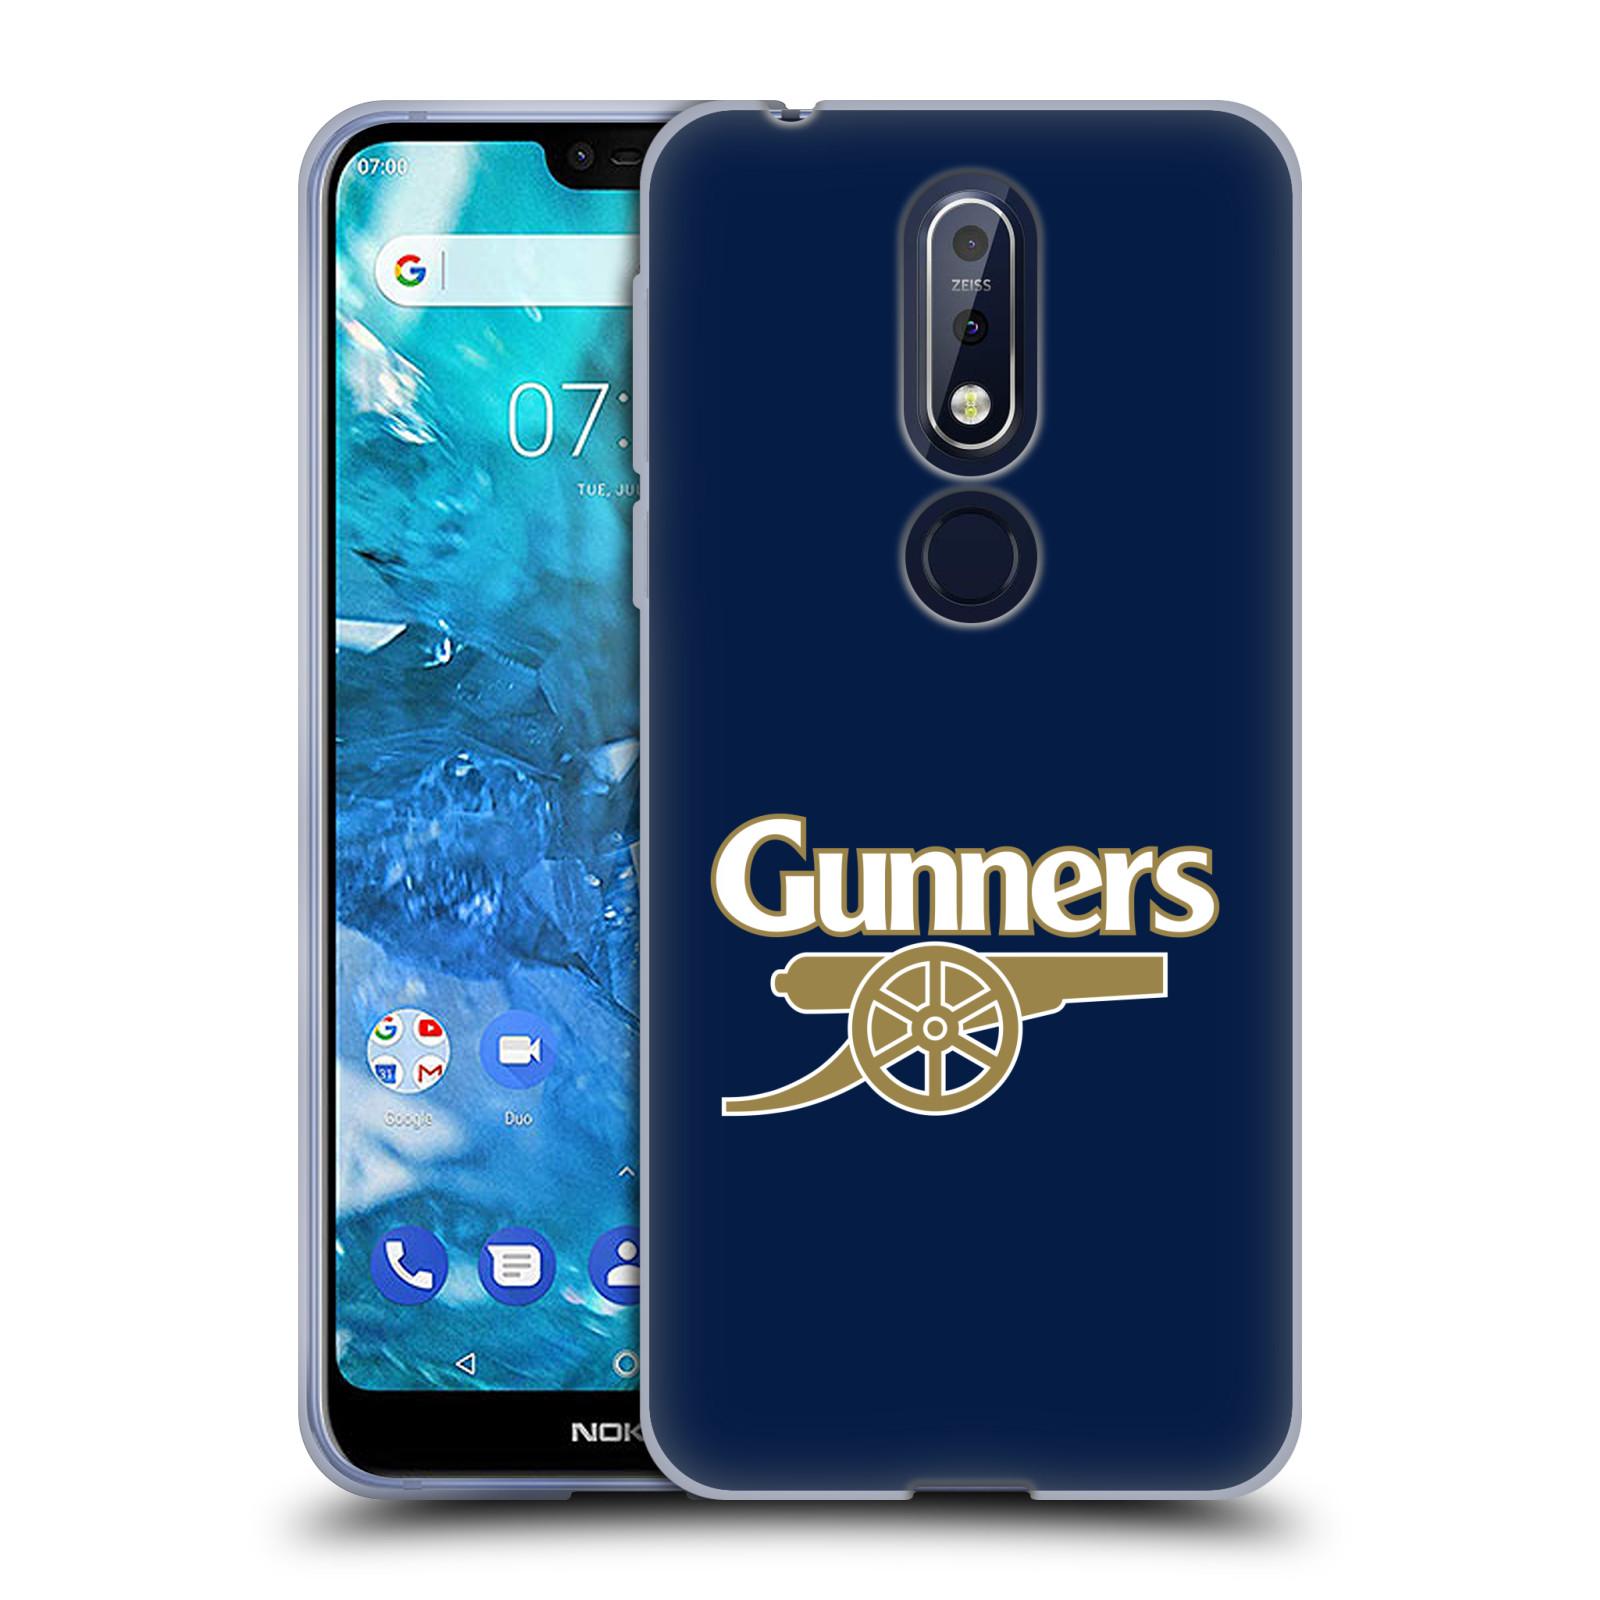 Silikonové pouzdro na mobil Nokia 7.1 - Head Case - Arsenal FC - Gunners